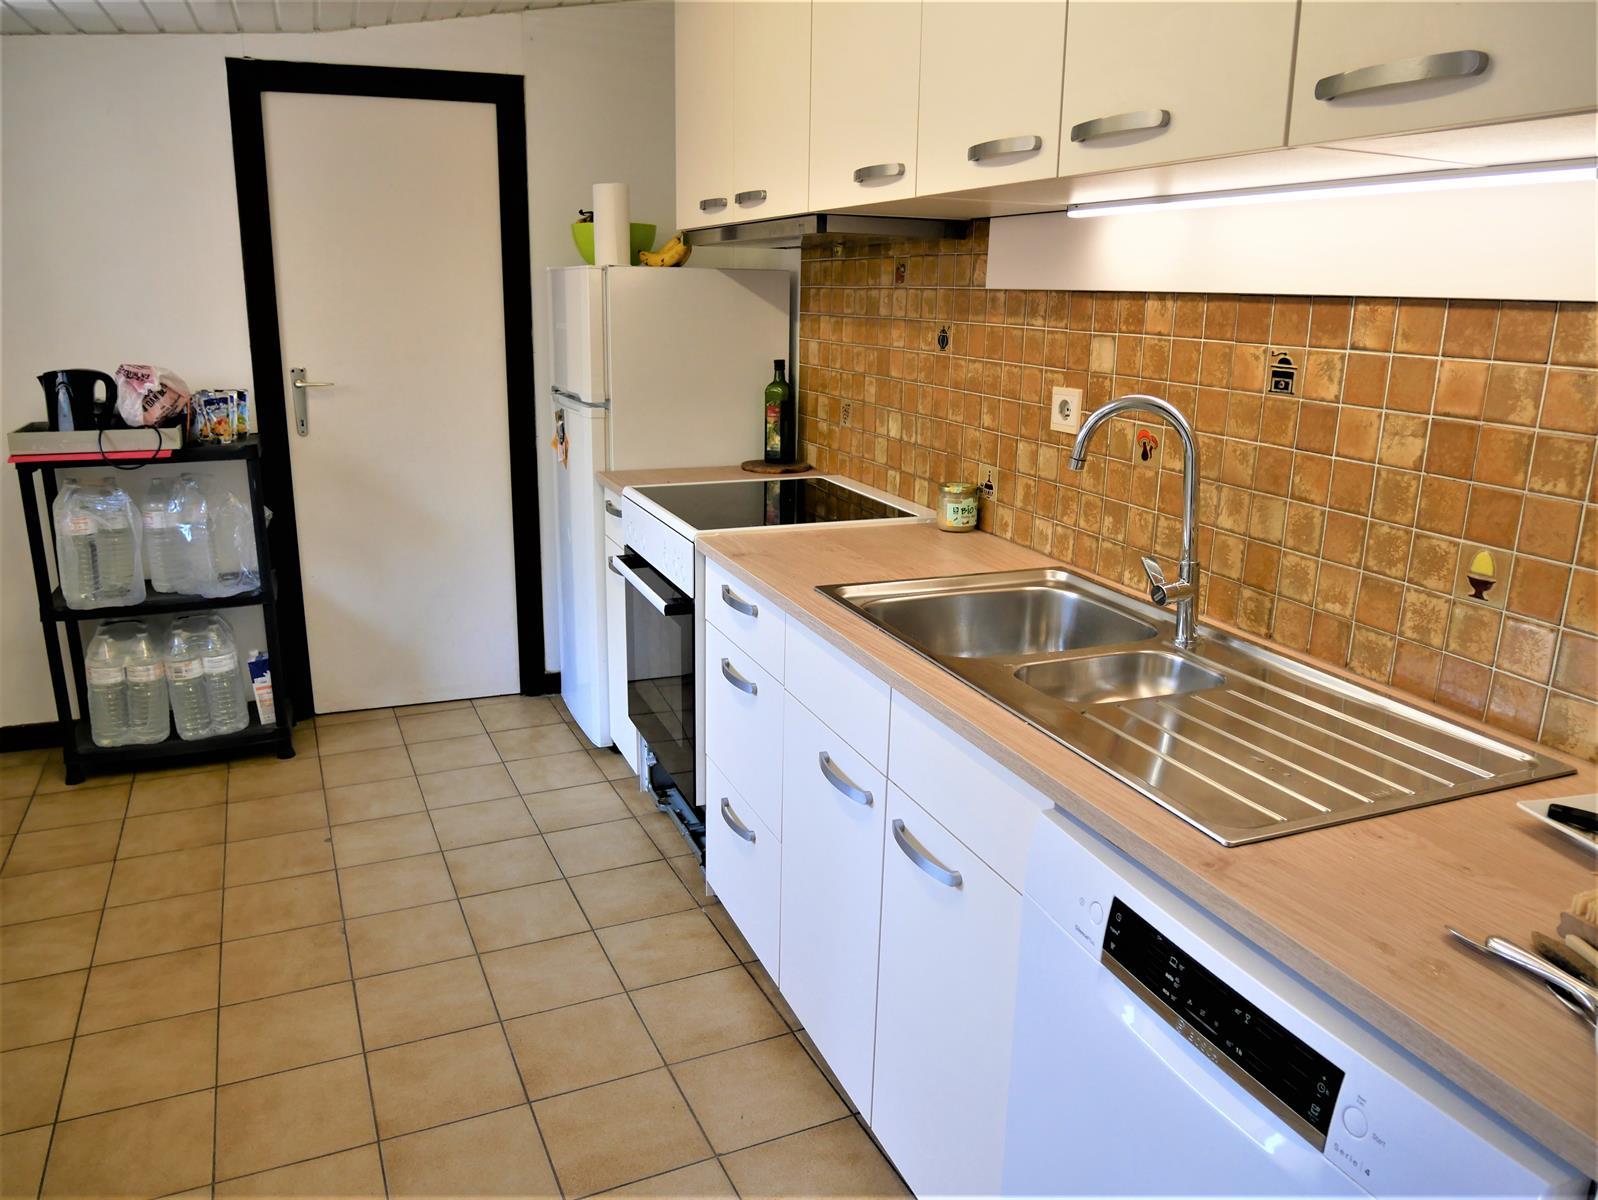 Maison - Ottignies-Louvain-la-Neuve - #4345933-3